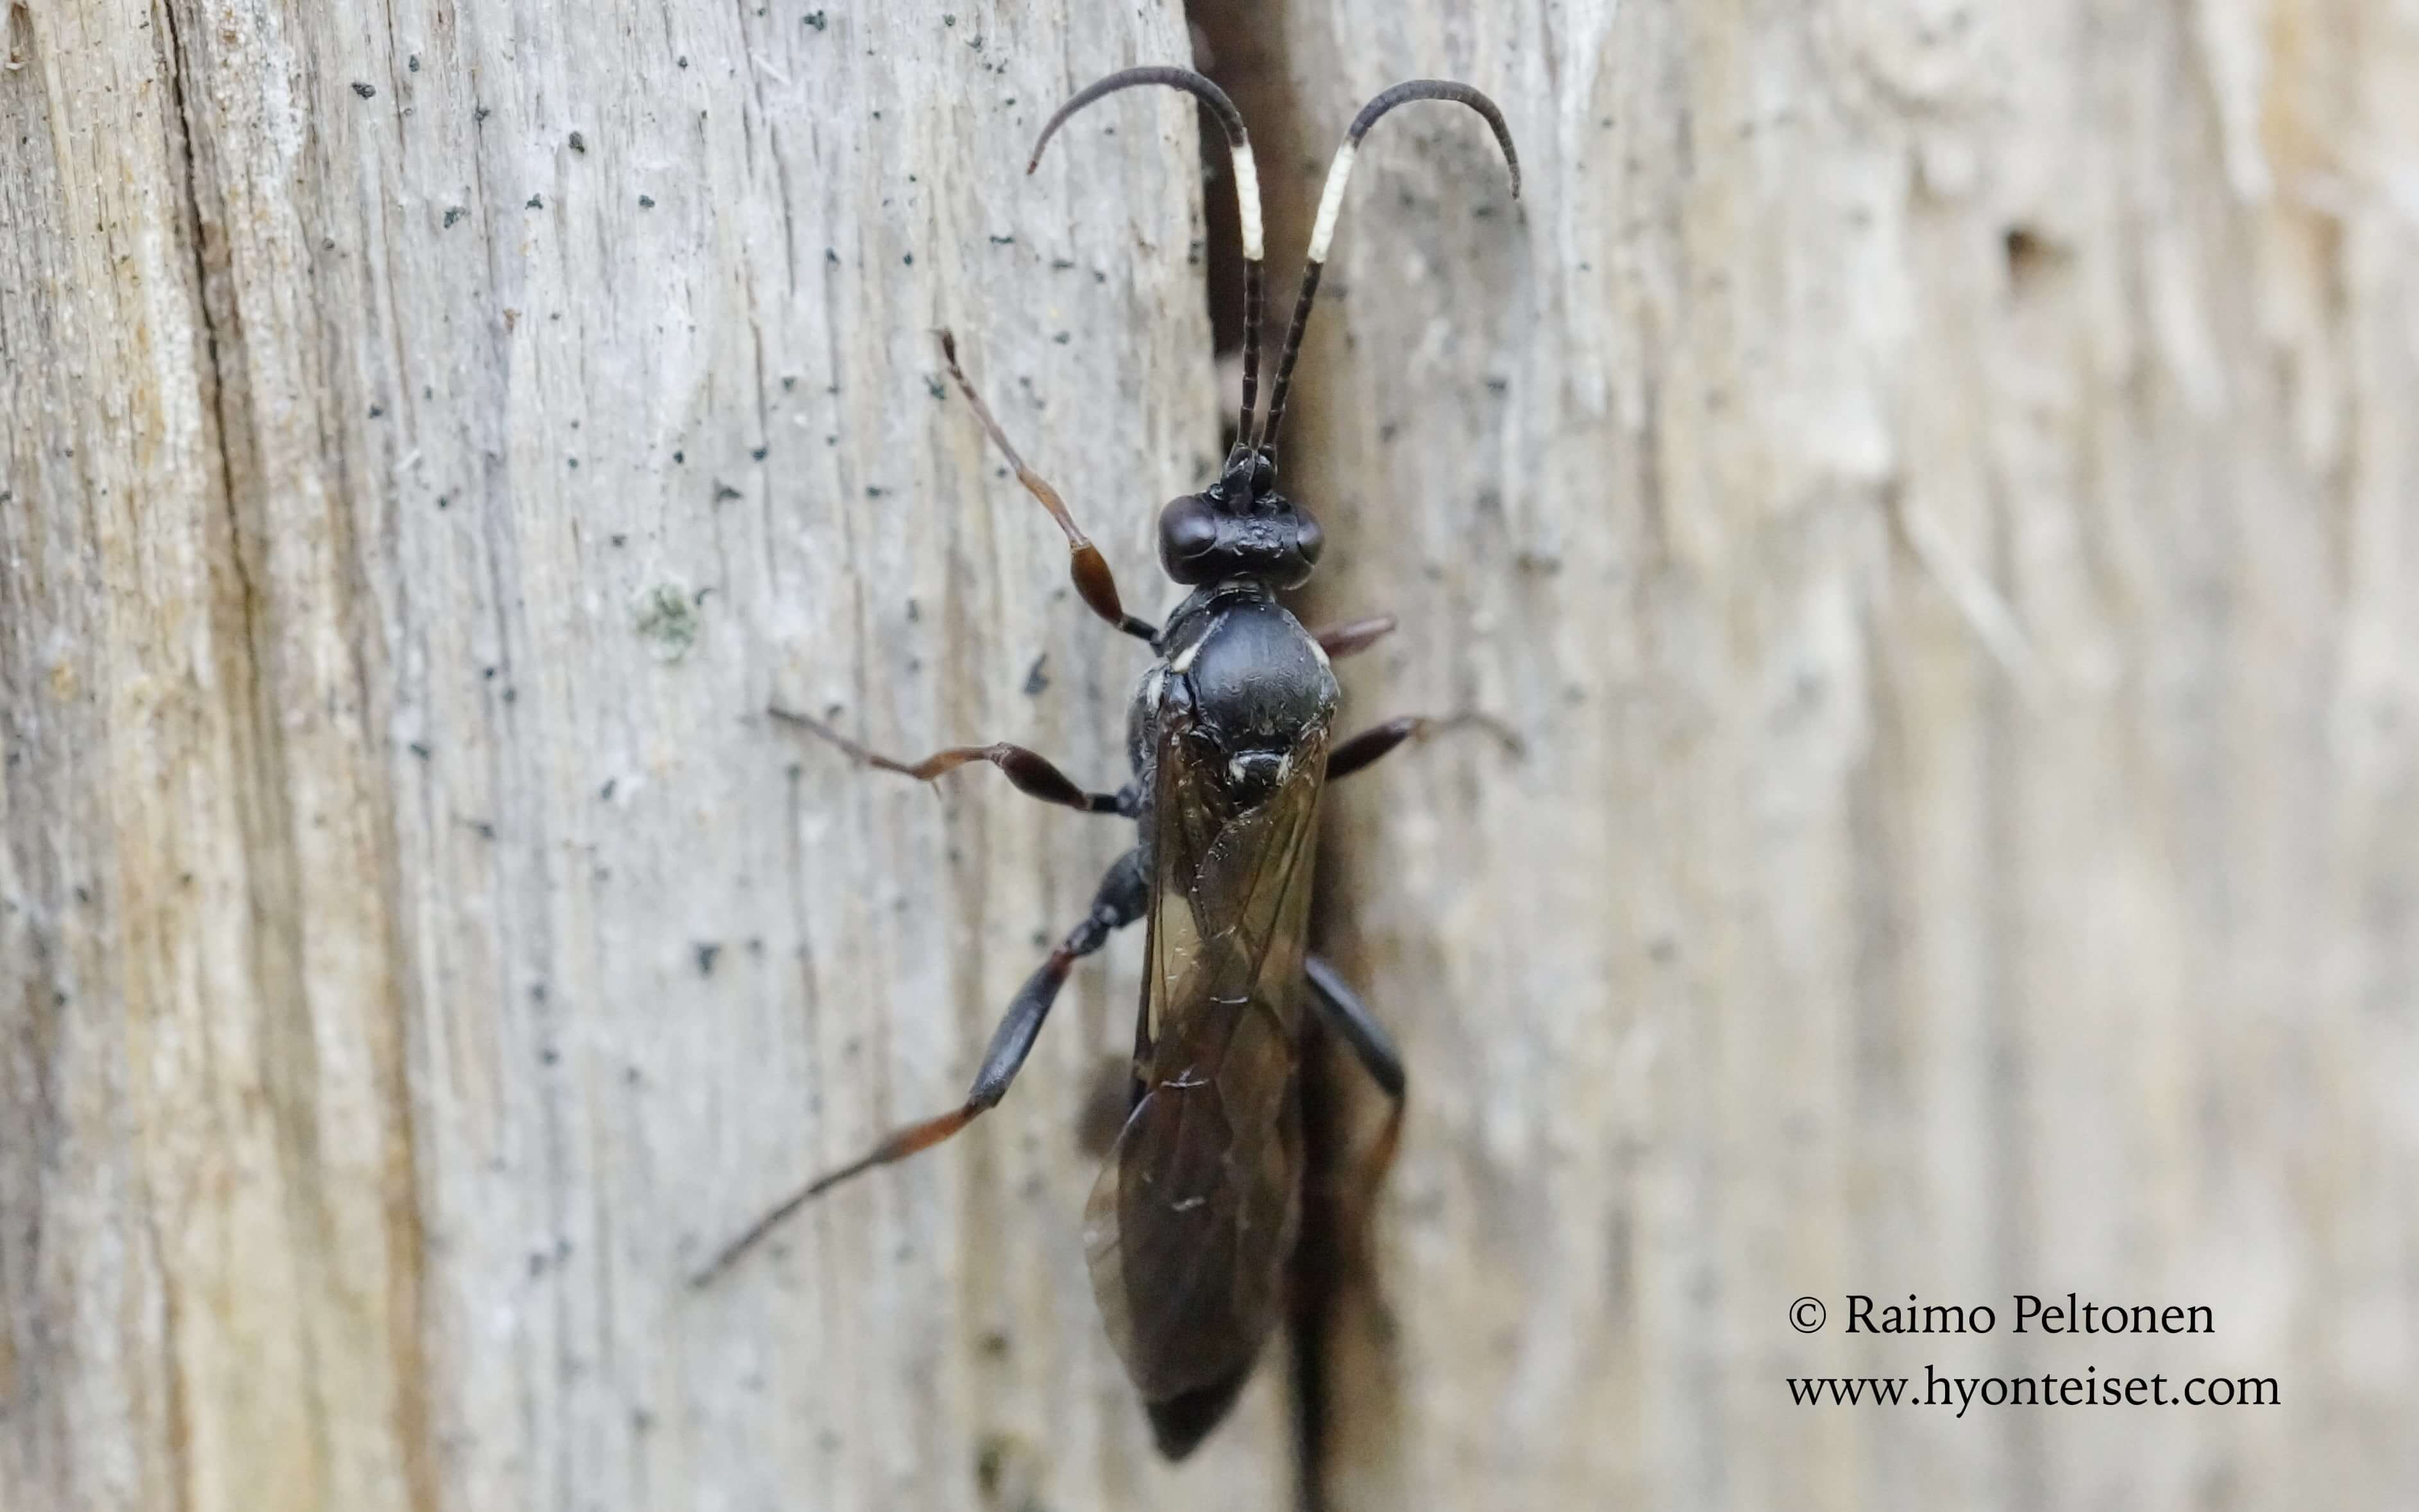 Ichneumoninae sp. (det. Gergely Varkonyi), 6.5.16 Patvinsuon kansallispuisto